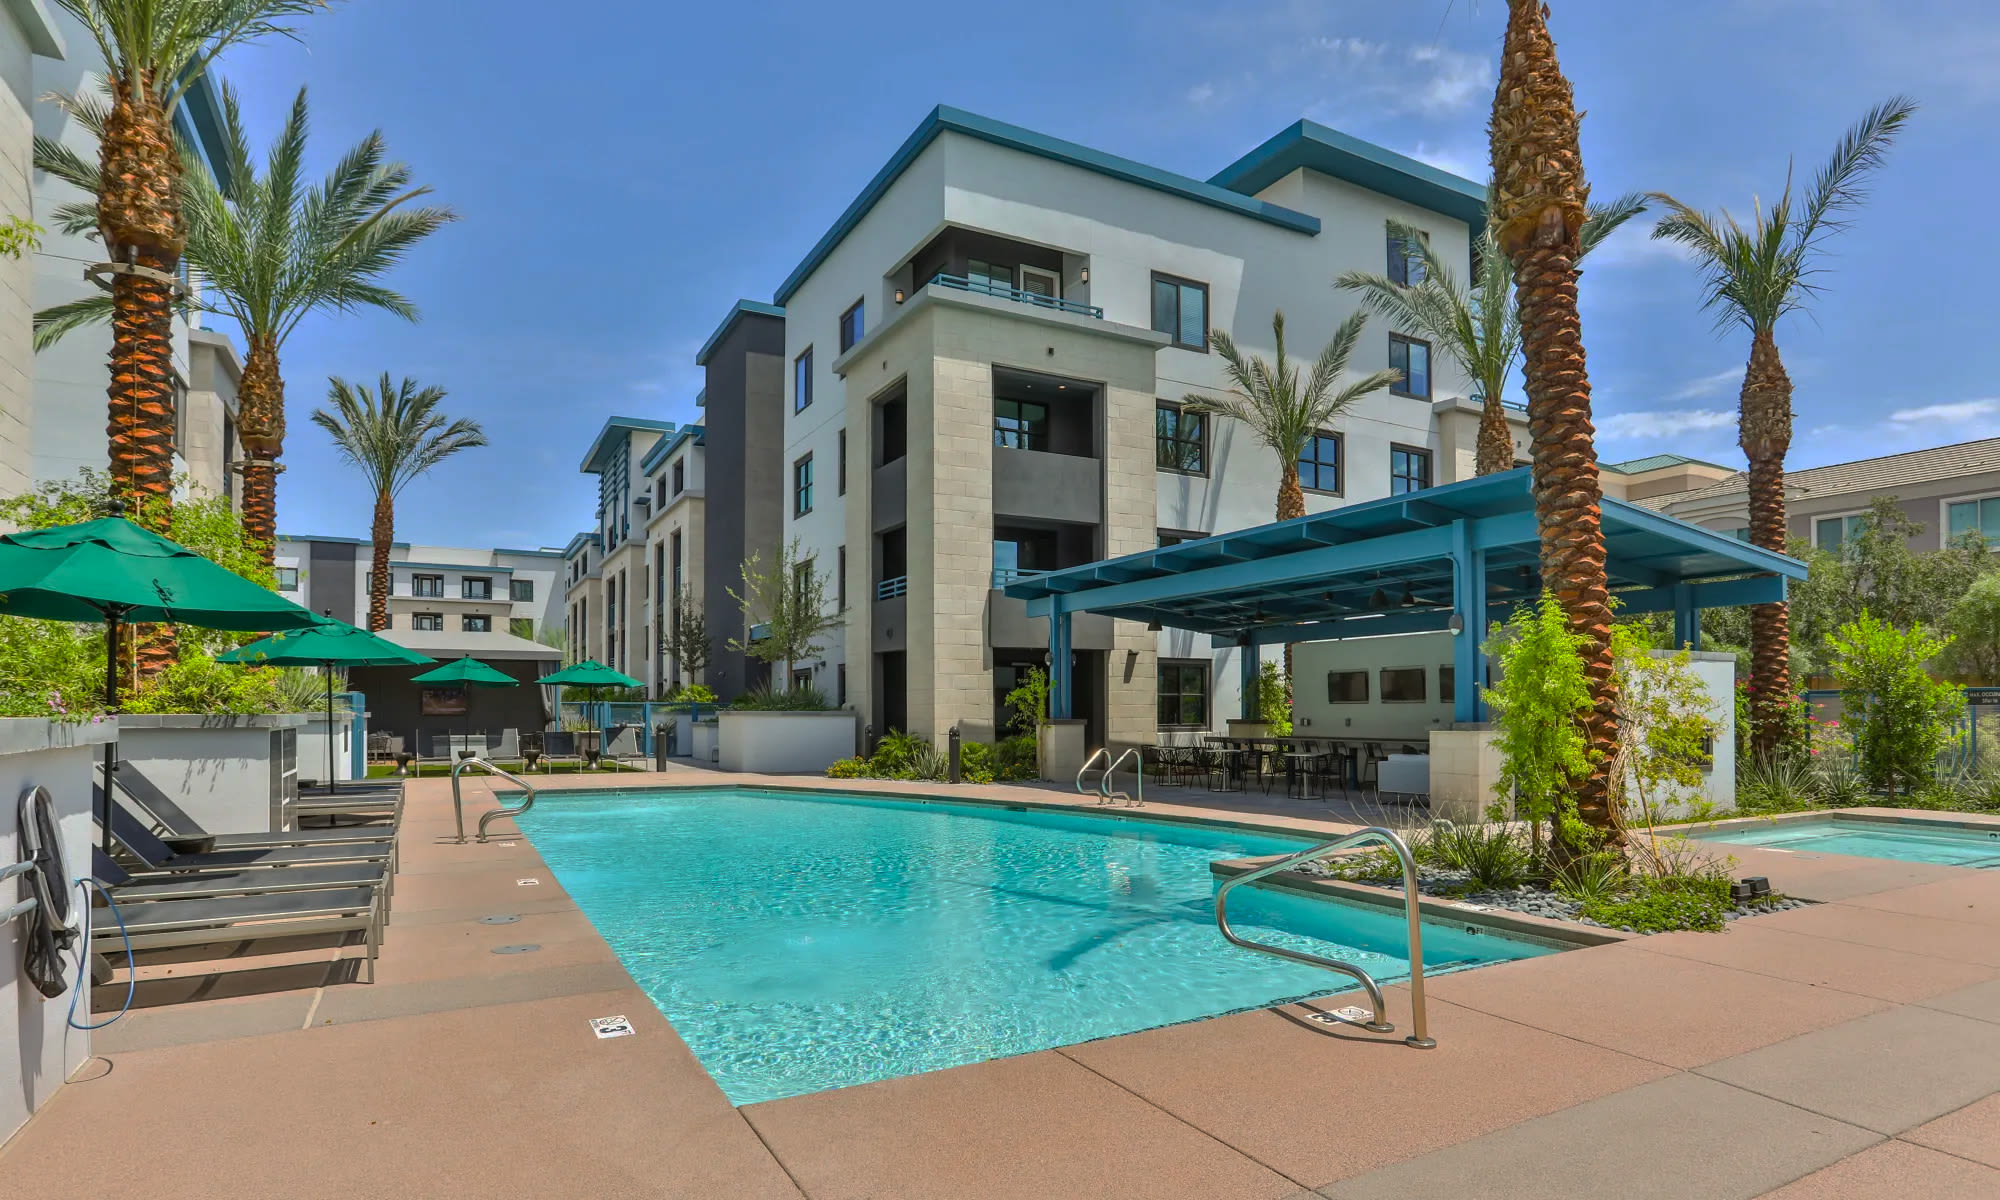 Luxury swimming pool at Lakeside Drive Apartments in Tempe, Arizona